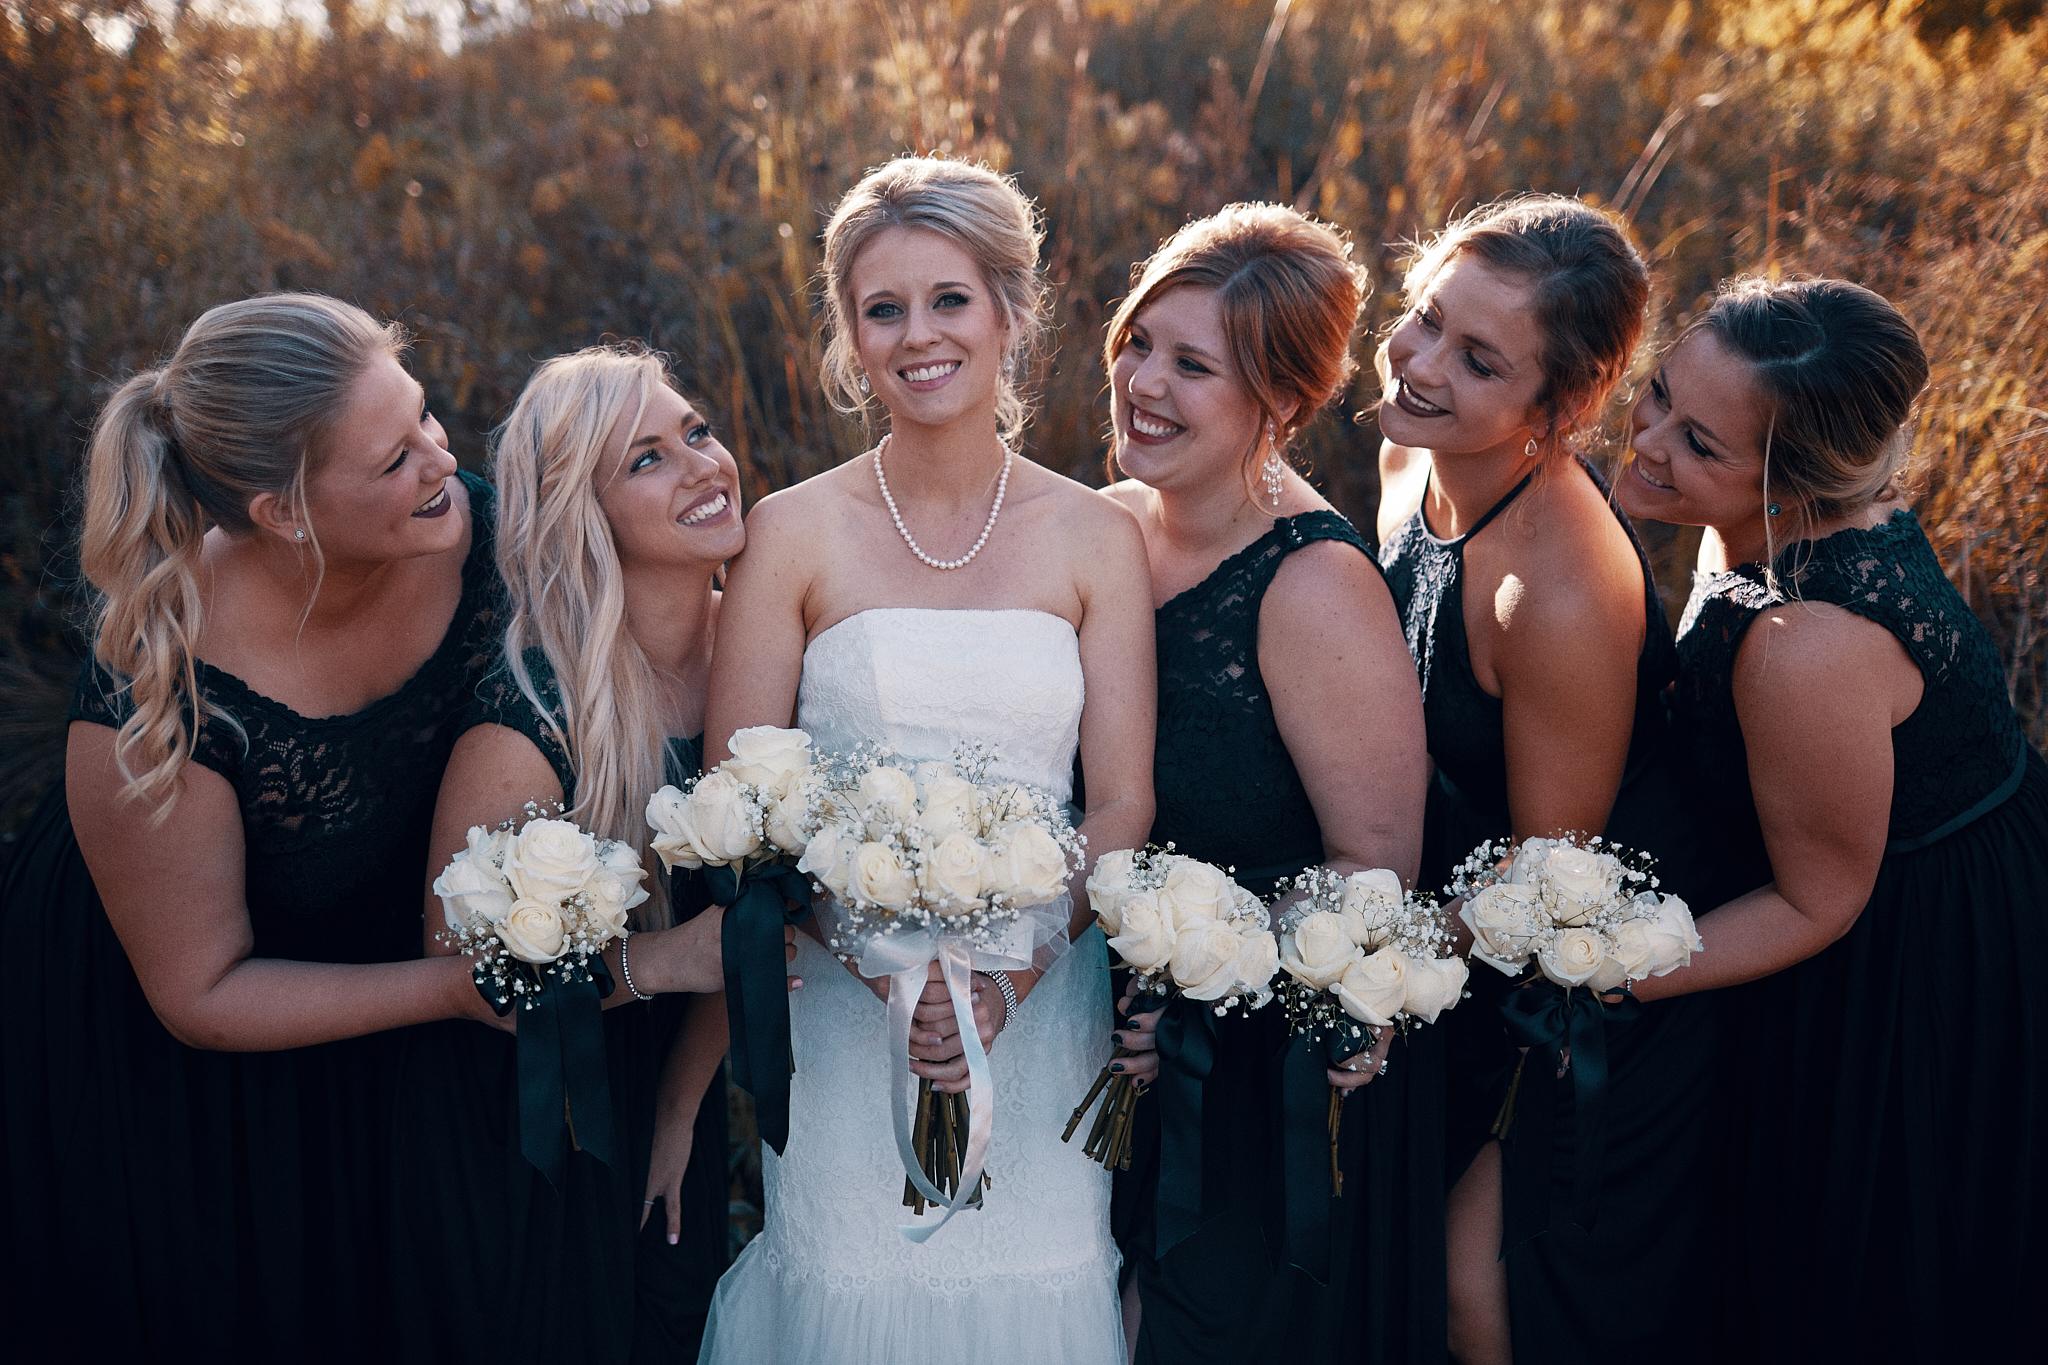 Wedding_By_High_End_Minneapolis_Brand_Photographer_Something_Candid_051.JPG